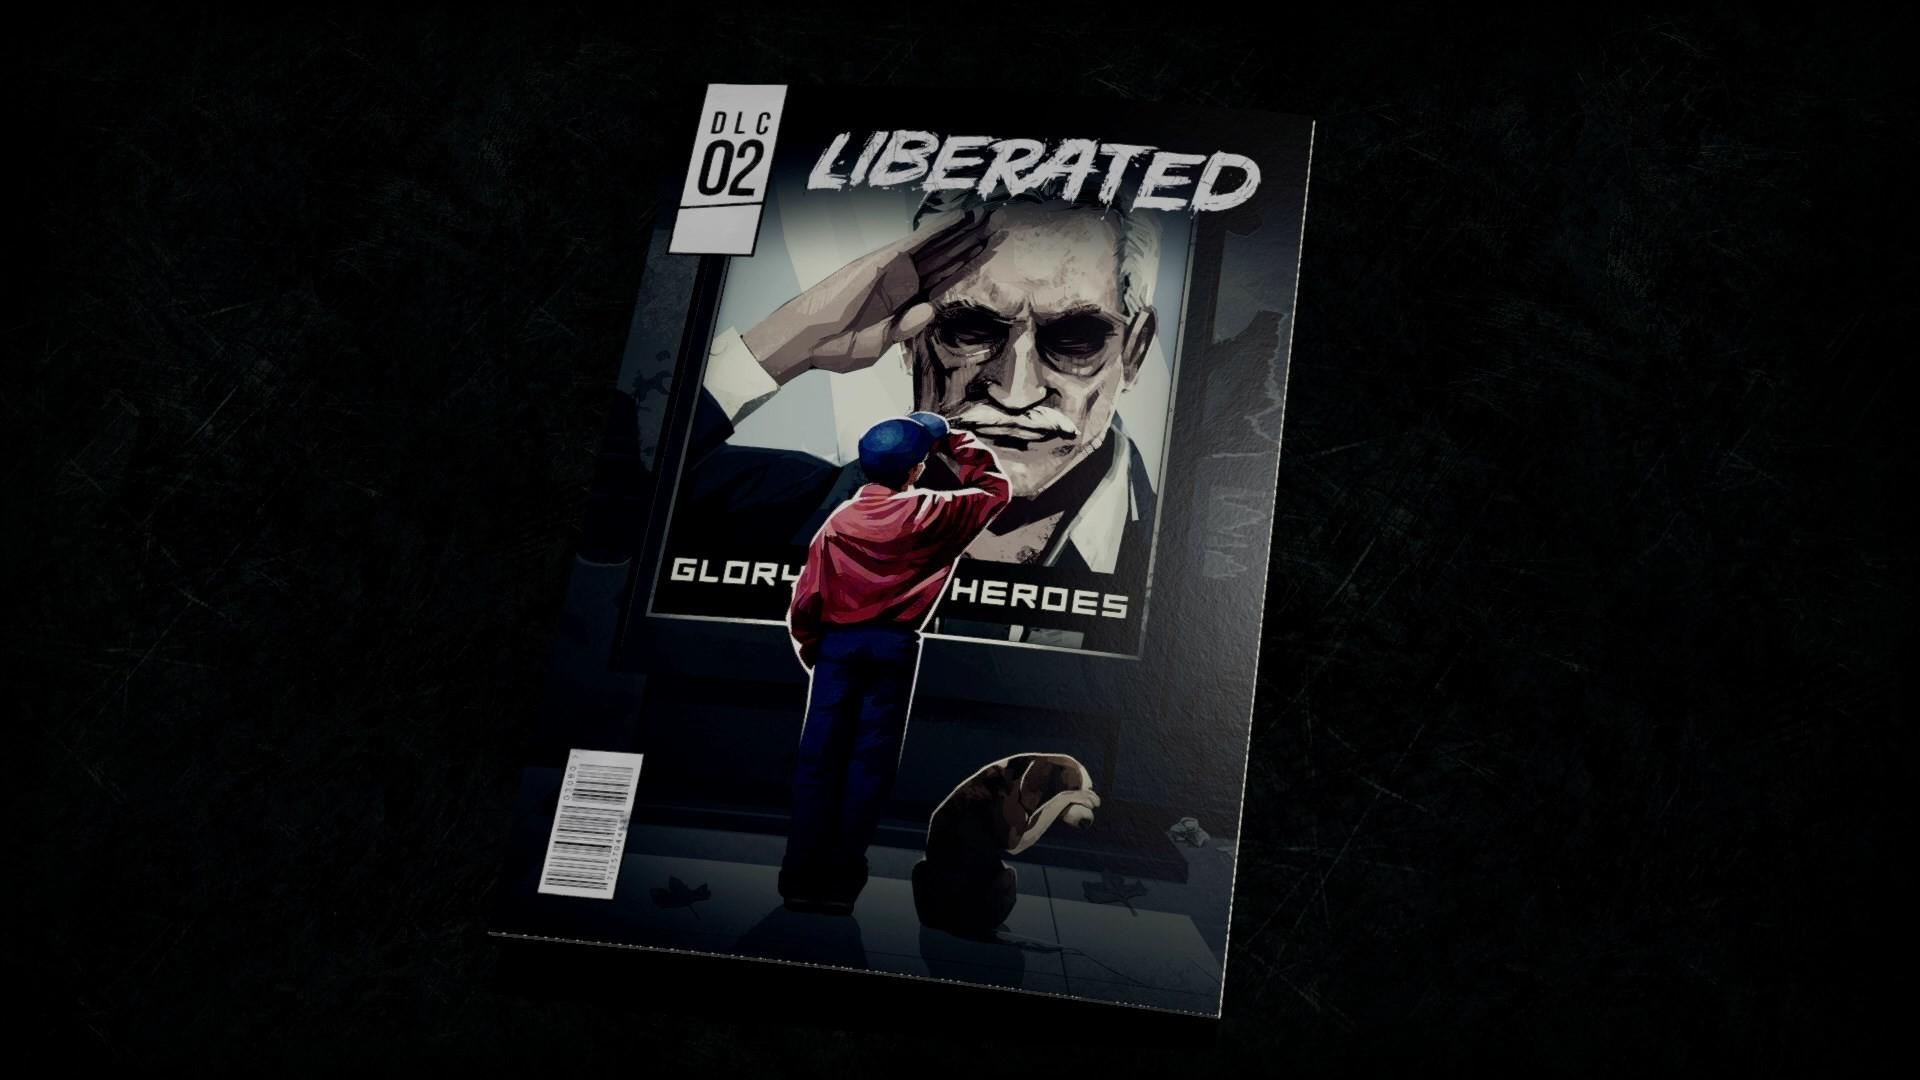 Liberated: Glory to the Heroes screenshot